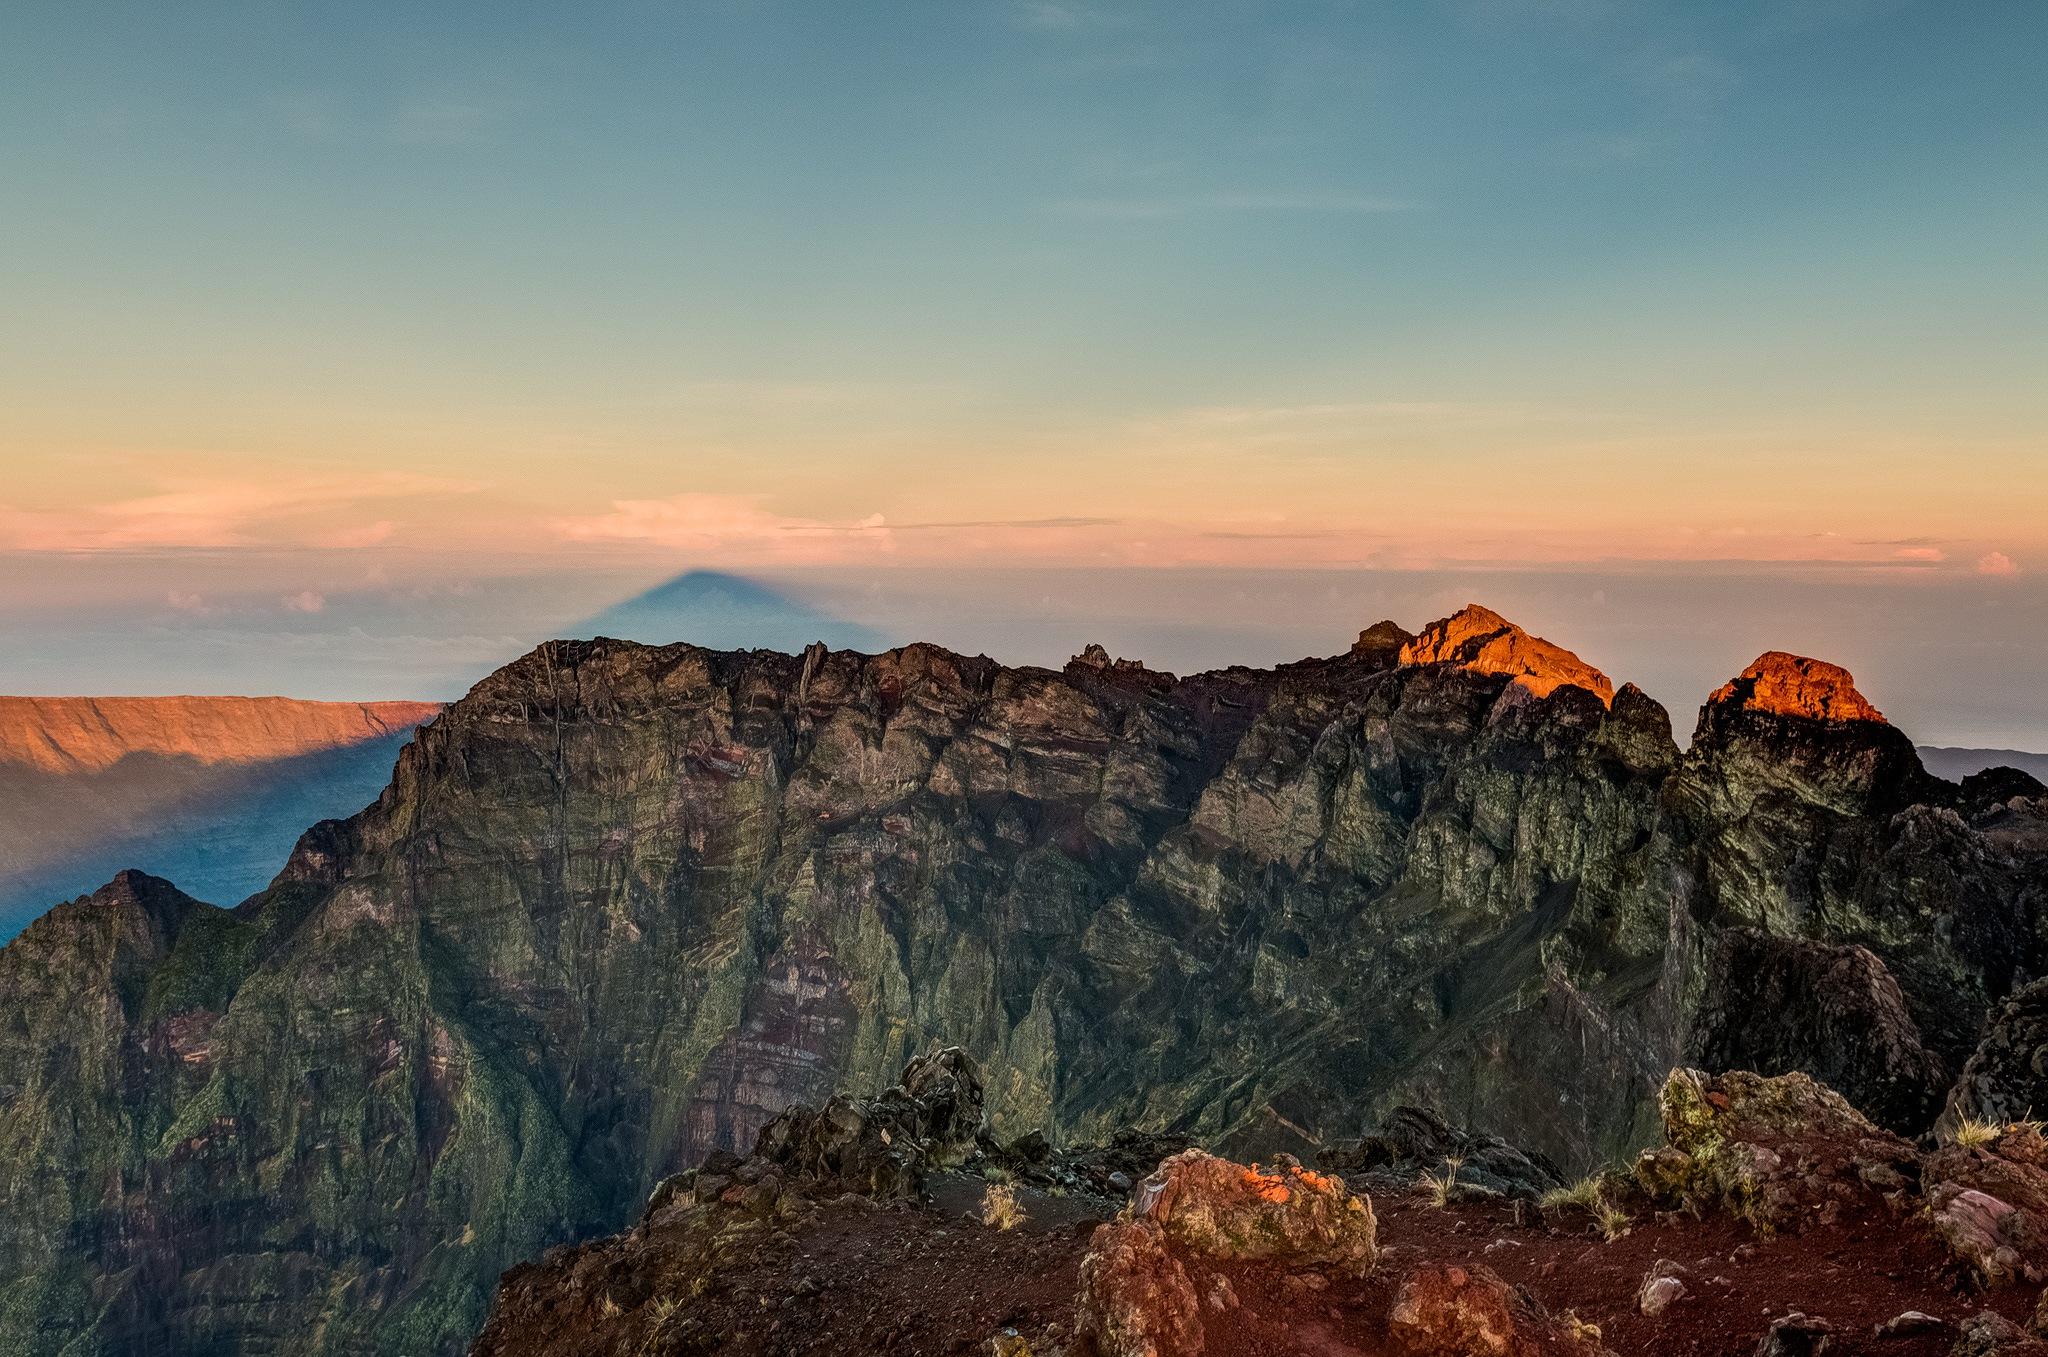 Mountain Shape by Manu974